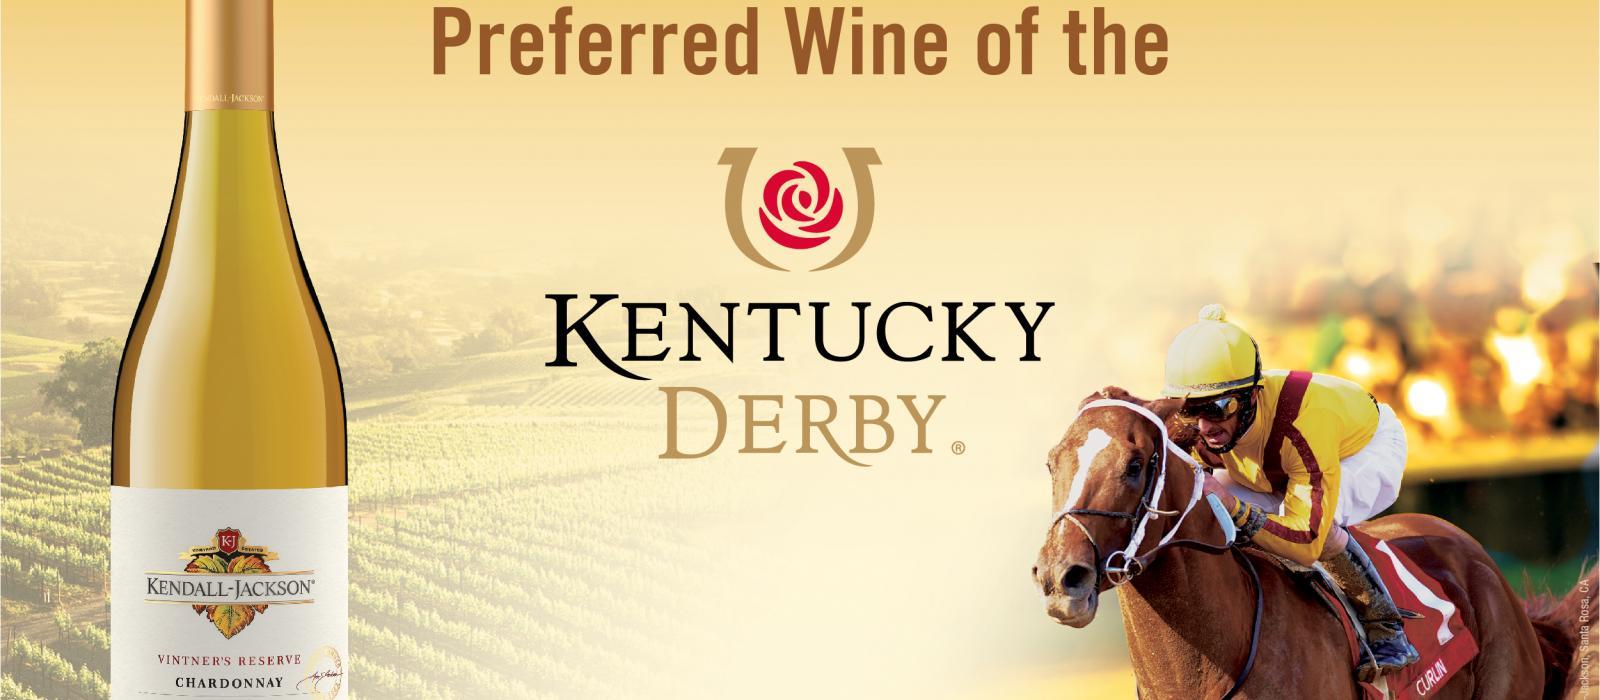 Kendall Jackson Kentucky Derby Sponsorship